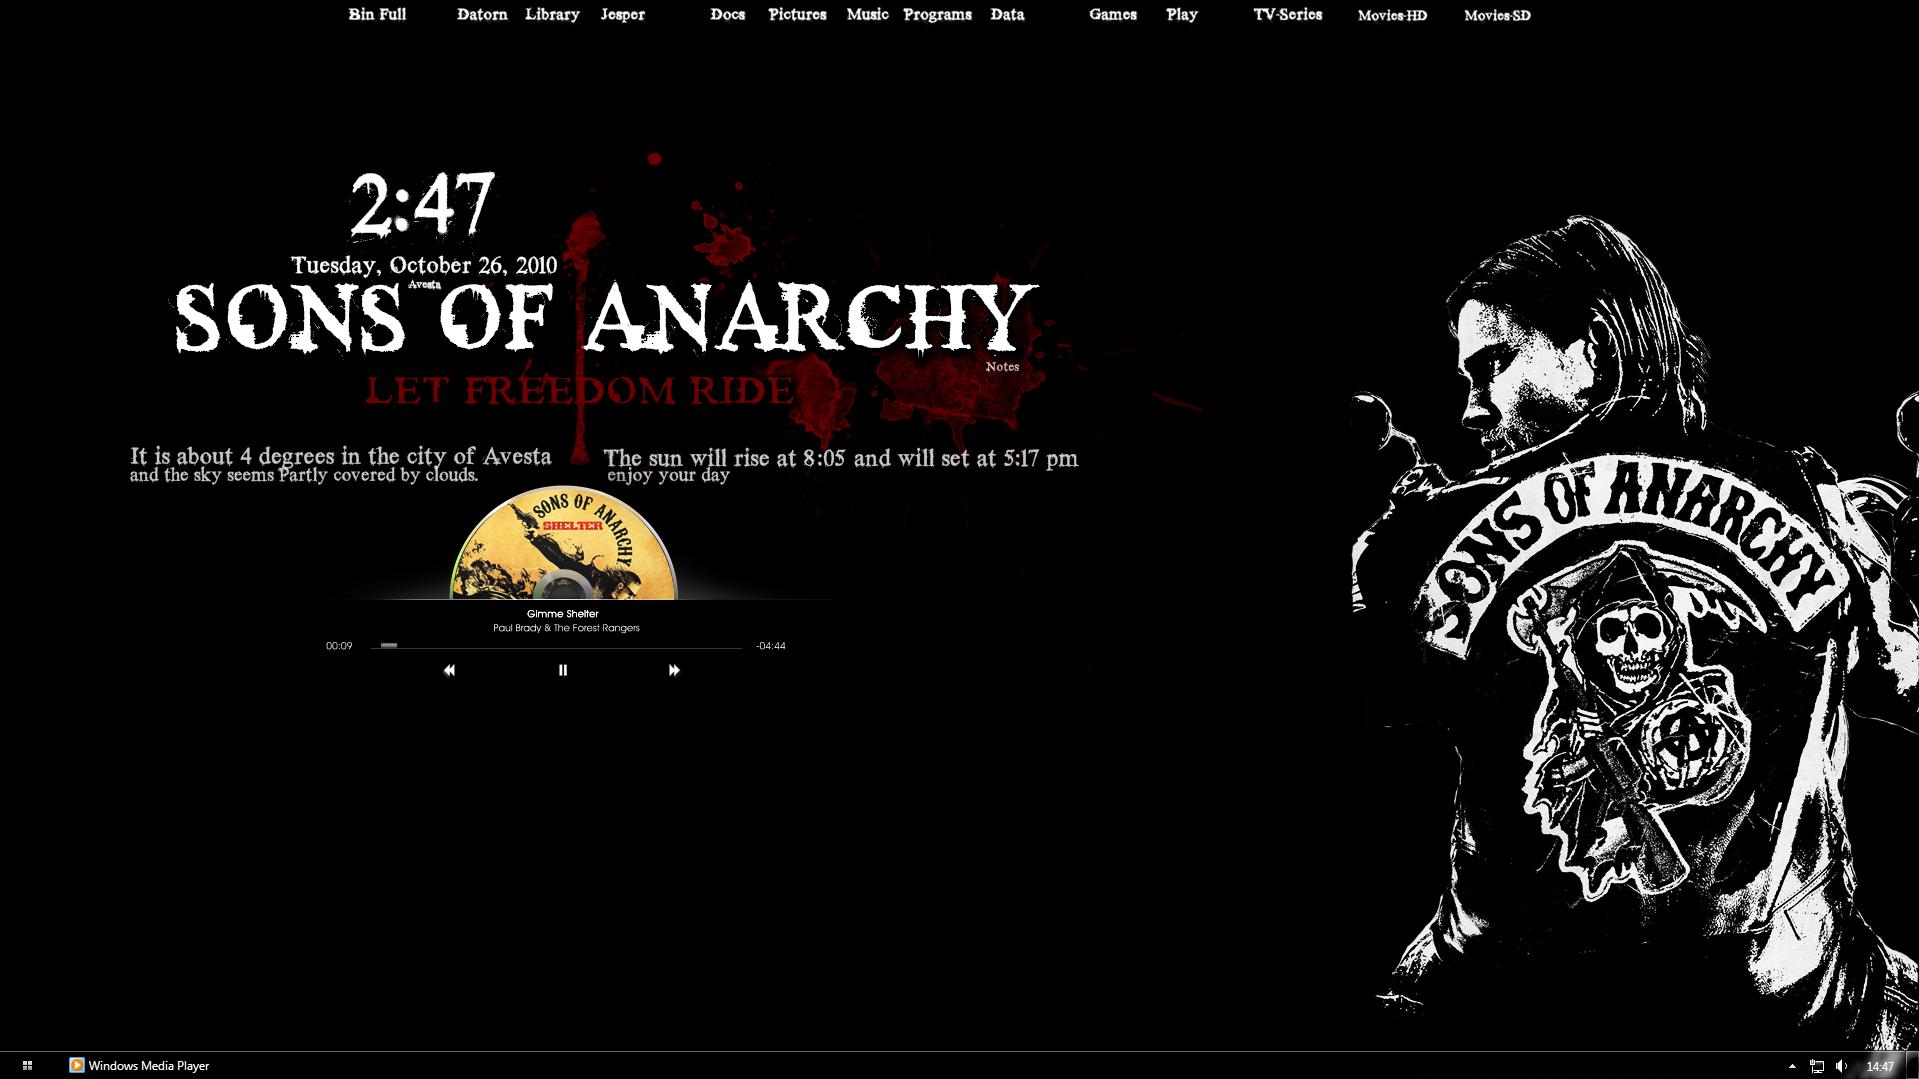 SOA Wallpaper Screensavers